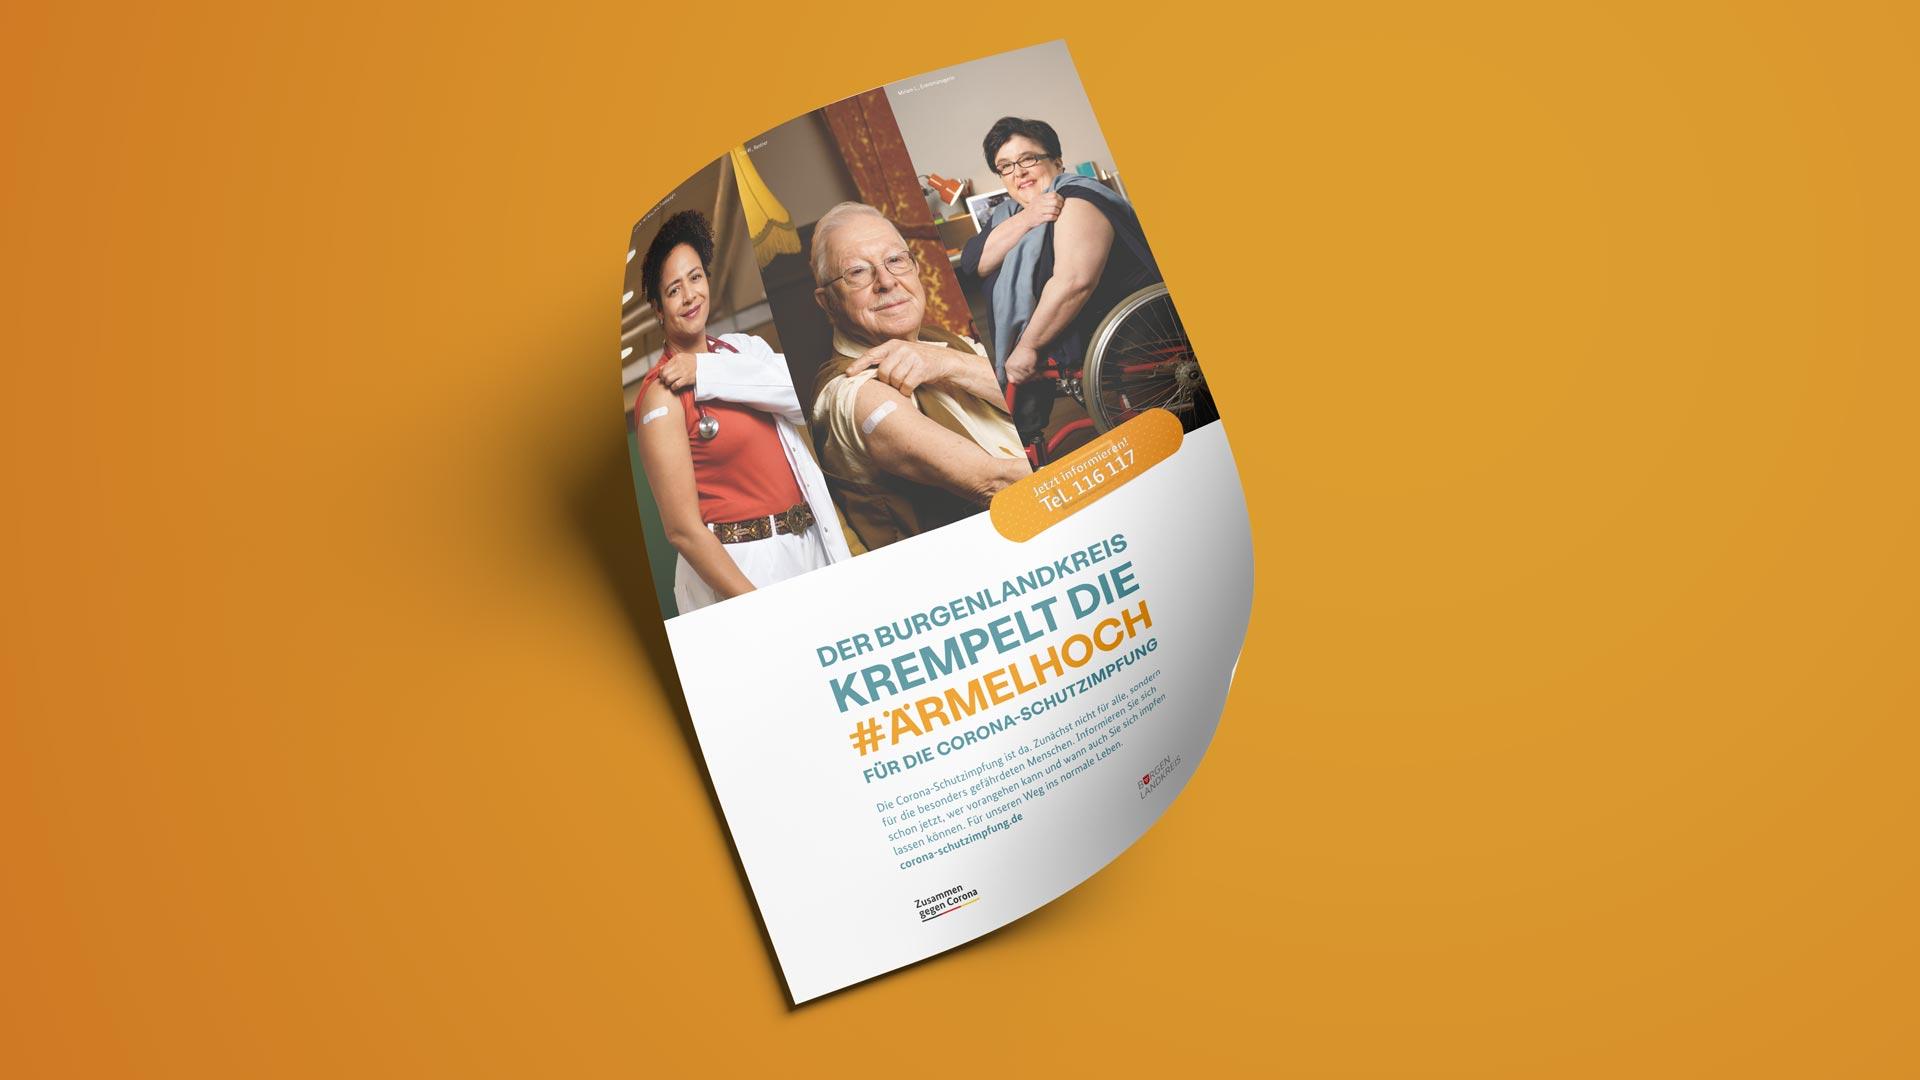 Plakat für die Coronavirus-Impfkampagne des Burgenlandkreises